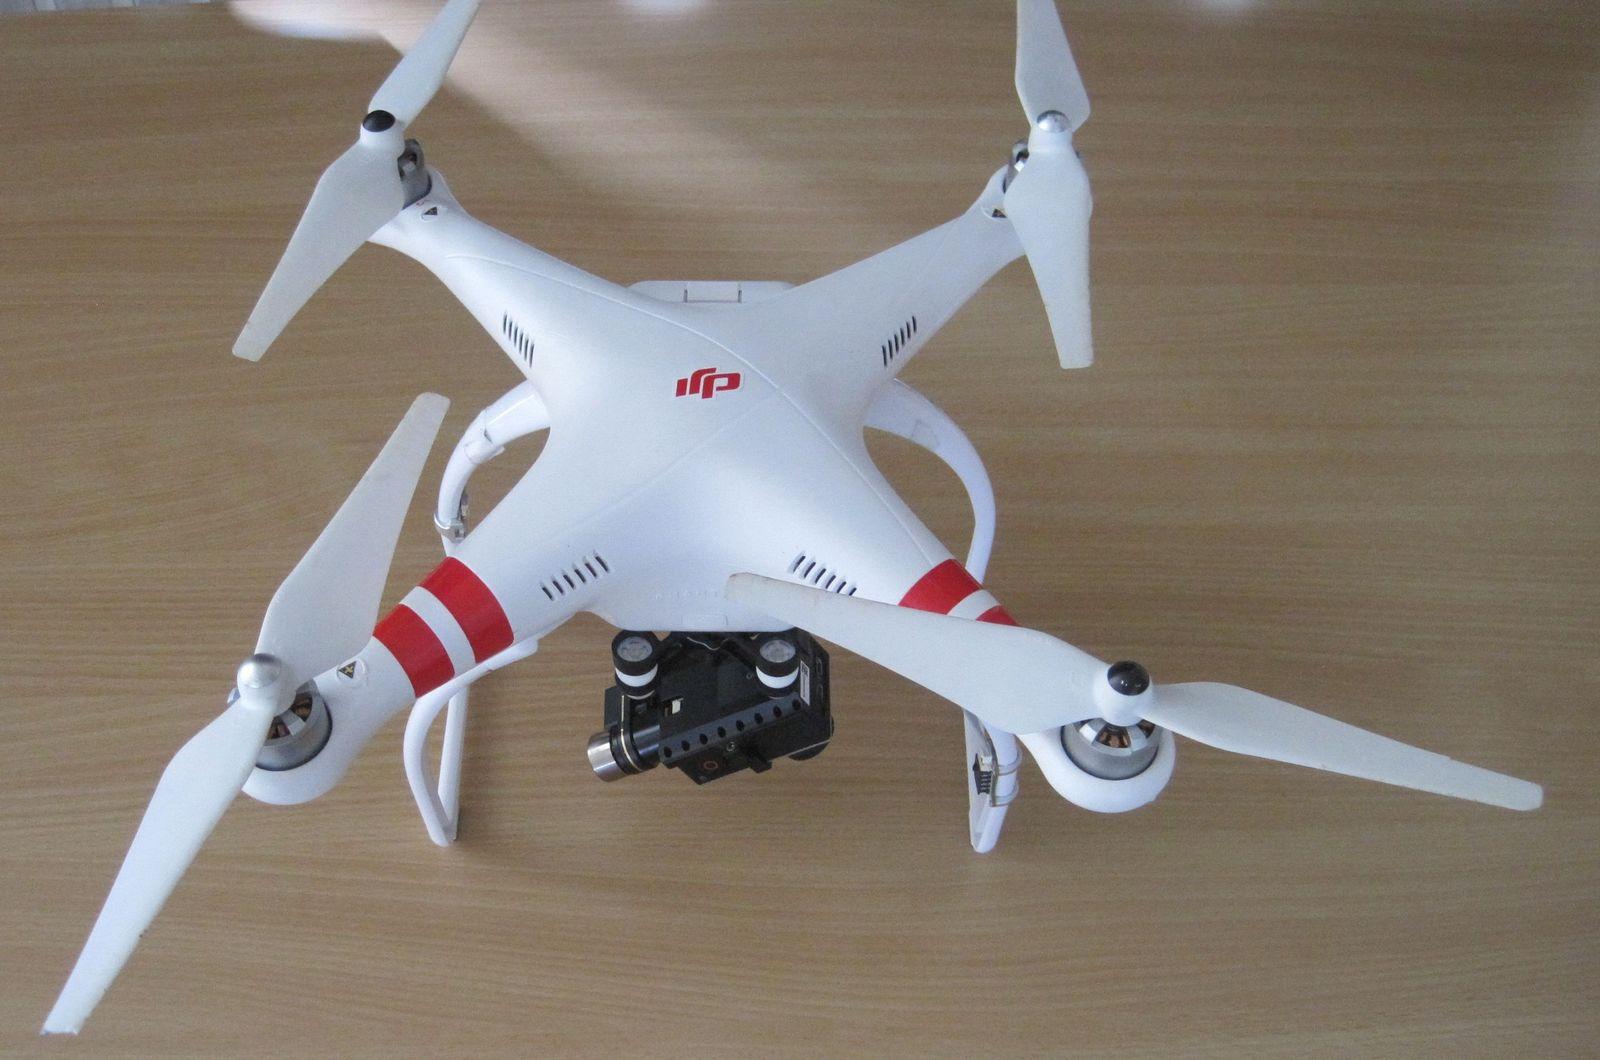 EINMALIGE VERWENDUNG Drohne/ Quadrocopter/ Phantom